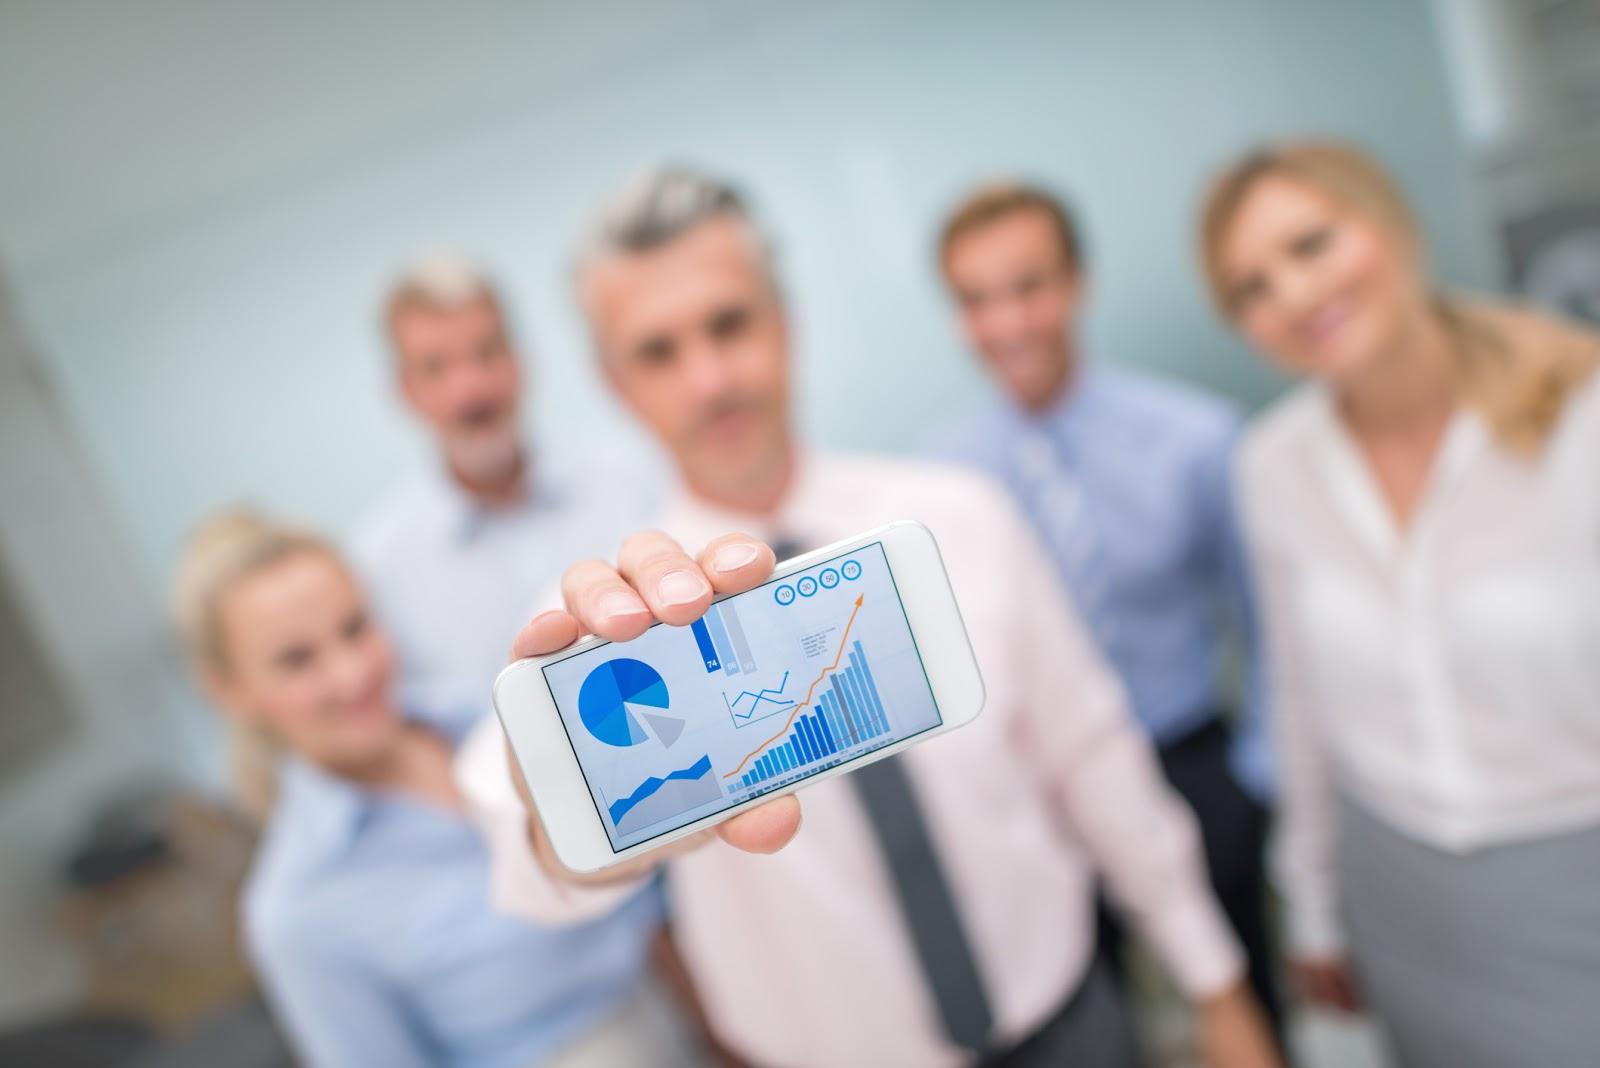 financial advisors showing digital marketing graphs on mobile phone